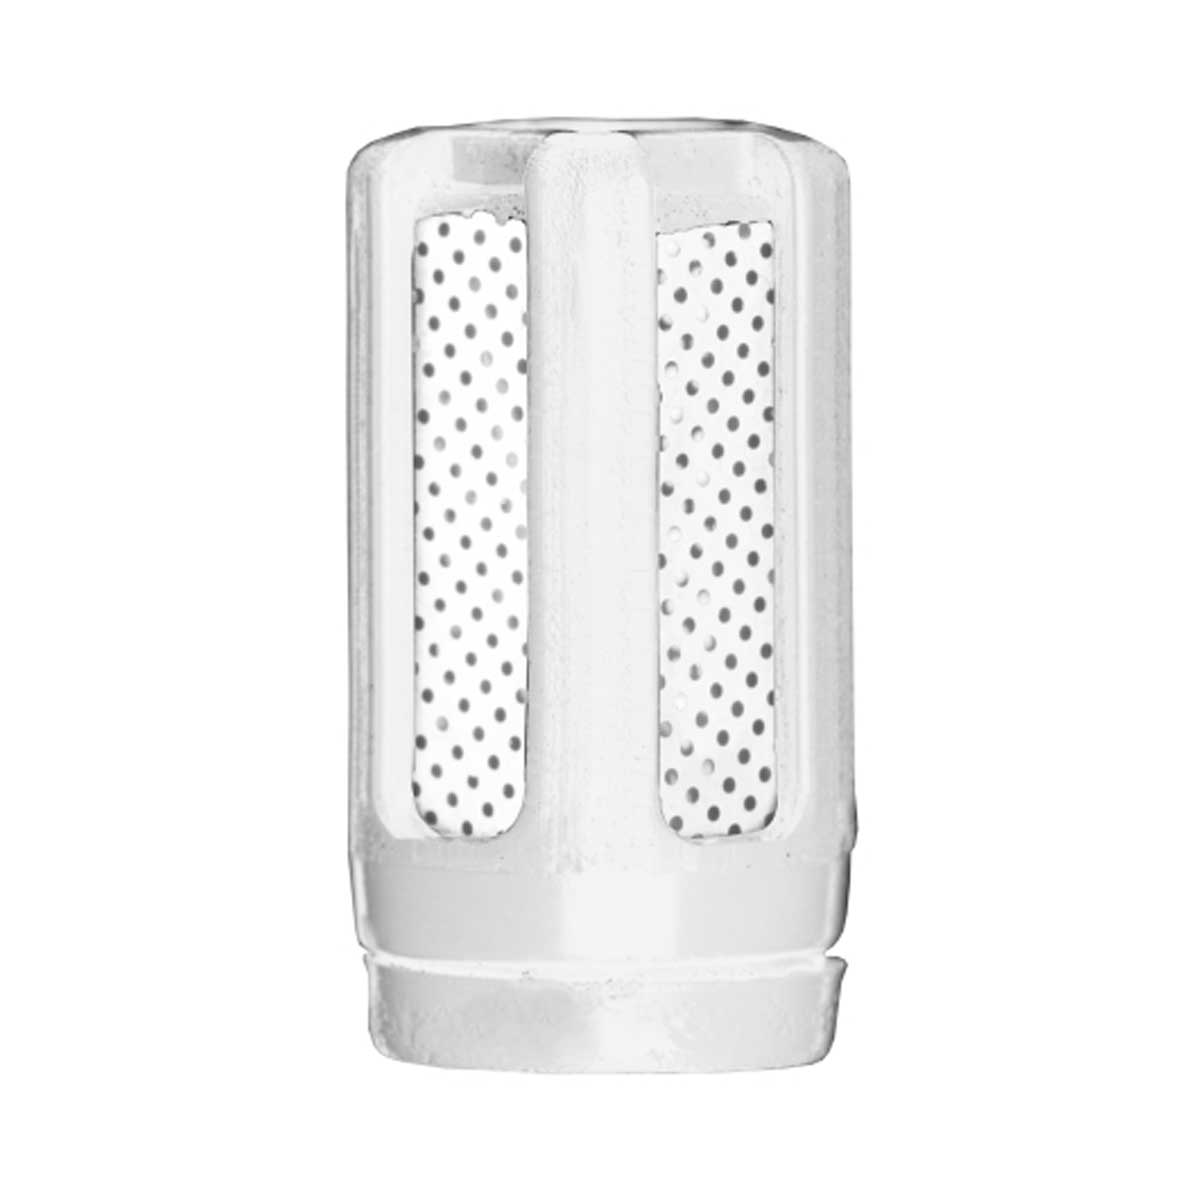 AKG エーケージー / WM81 WIREMESH white 白 (MicroLite Series カーディオイド・モデル用ワイヤーメッシュキャップ) 5個入り【お取り寄せ商品】